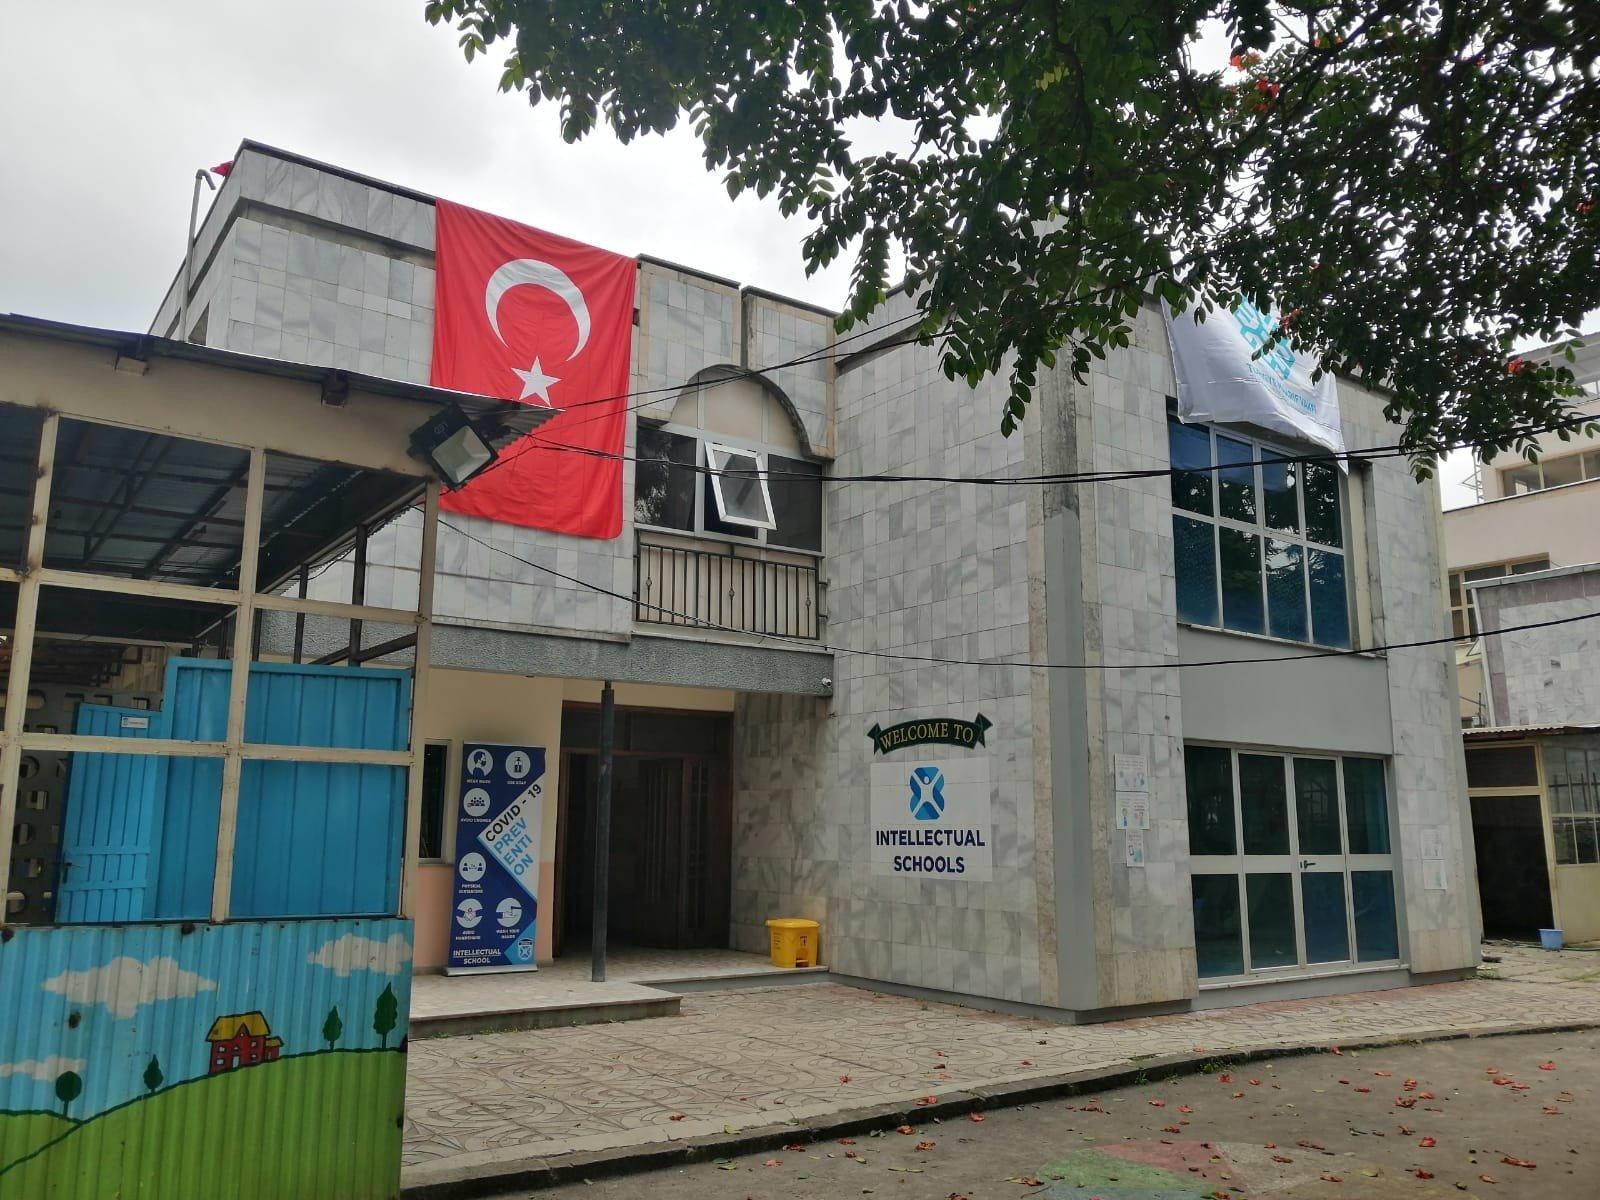 Turkey's Maarif Foundation has taken over 11 FETÖ-linked schools in Ethiopia, Aug. 12, 2021. (IHA Photo)